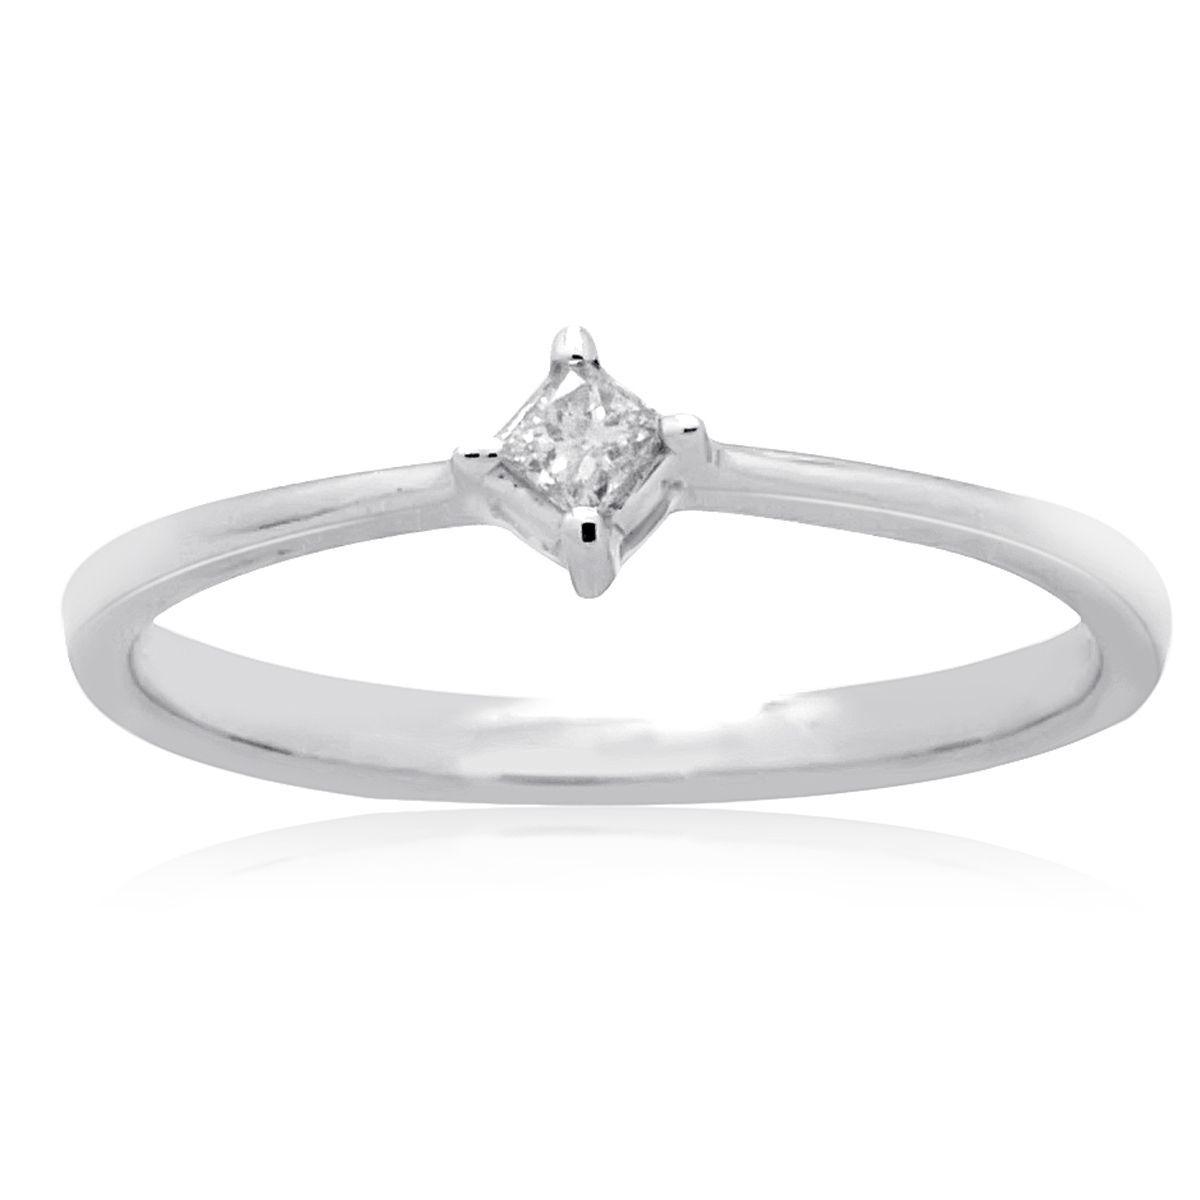 K white gold princesscut diamond accent promise solitaire ring